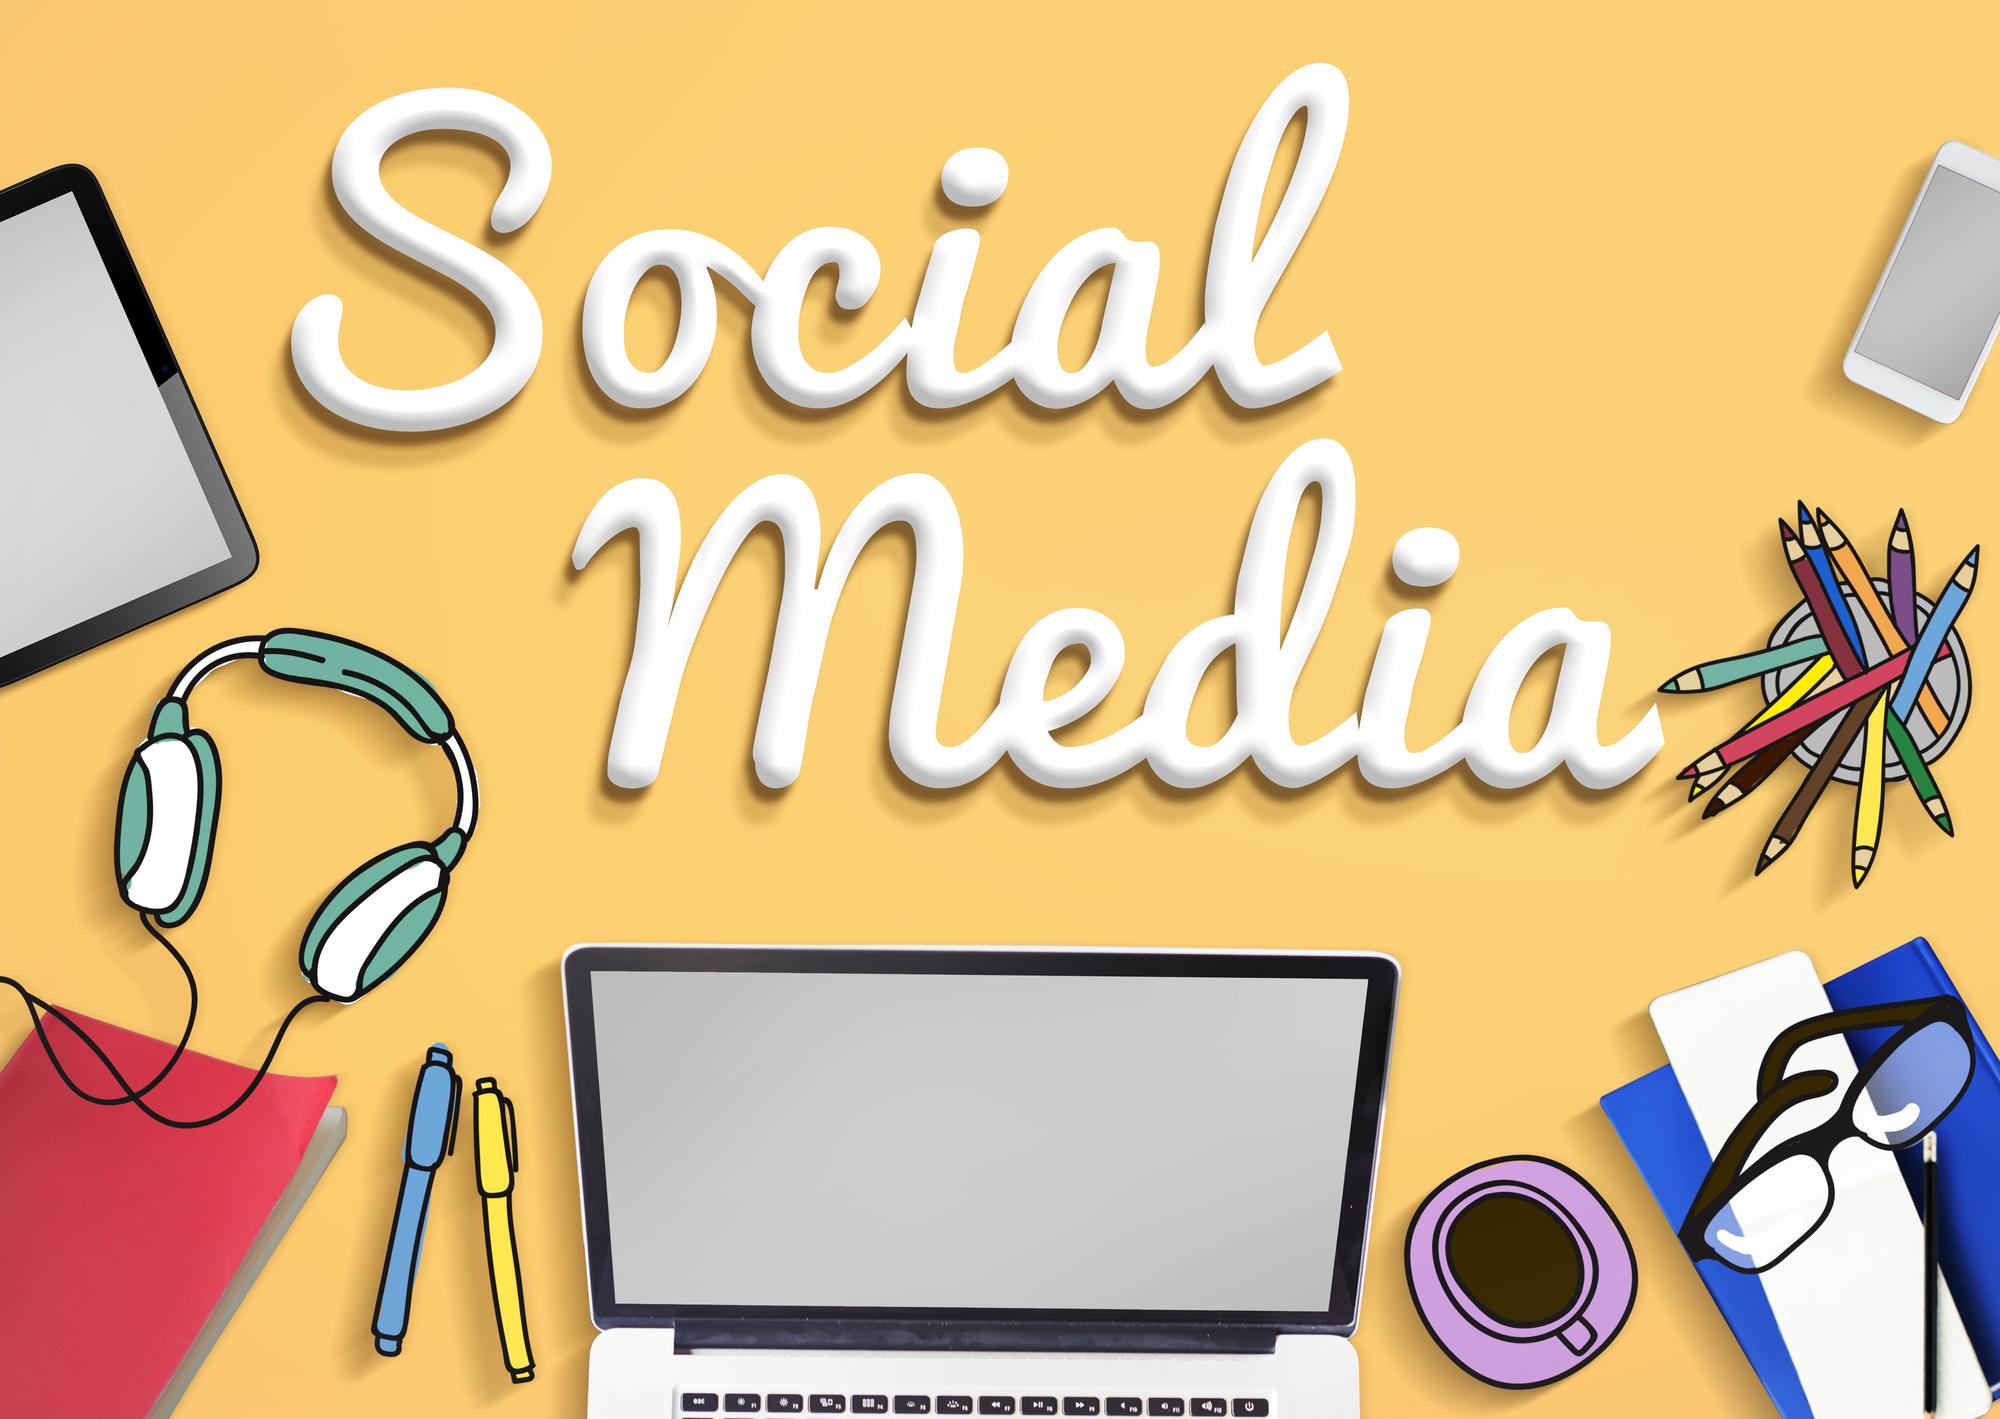 Top 10 Social Media Post Ideas for Dentists